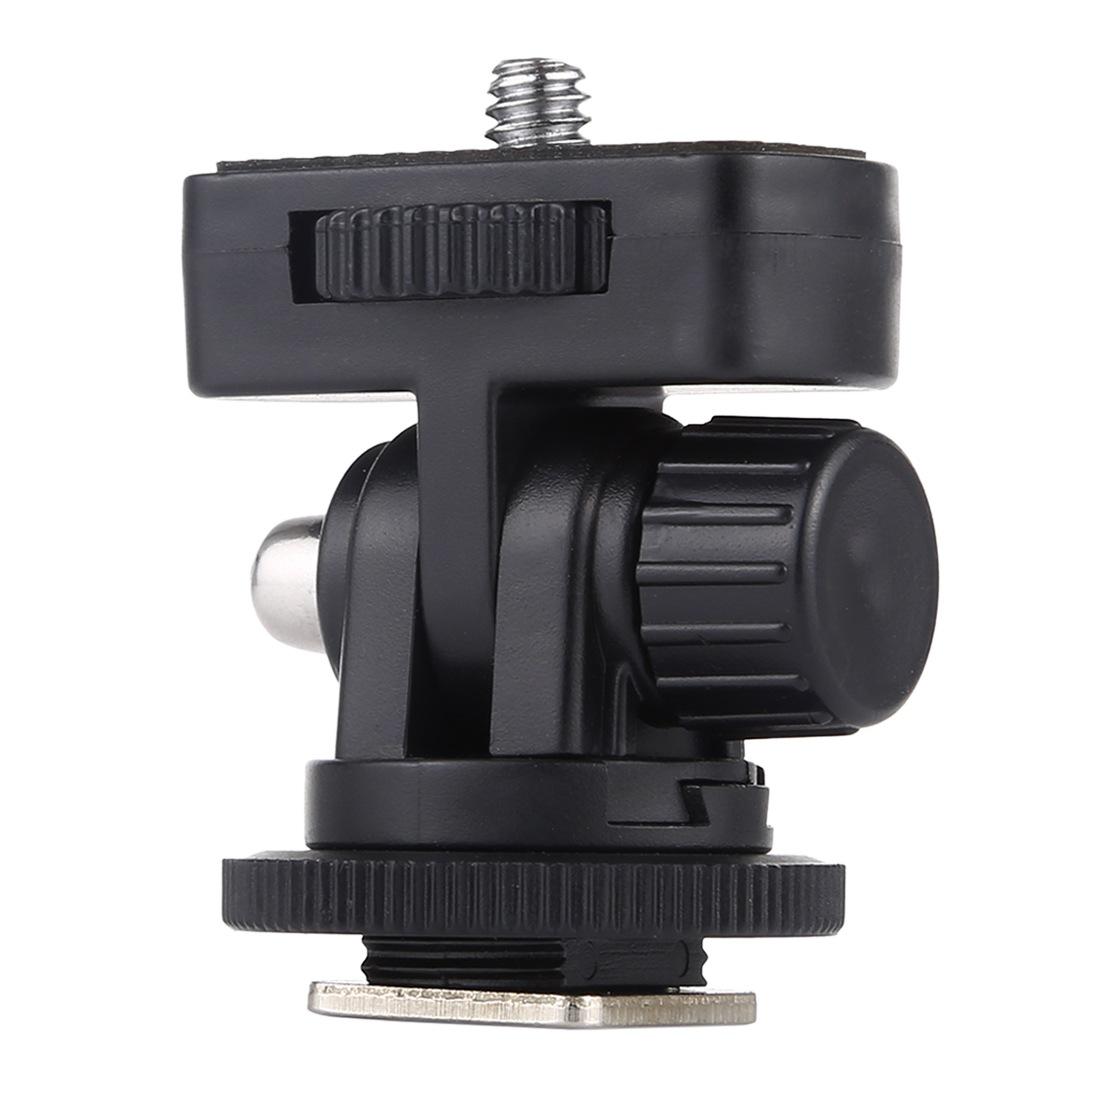 1/4 inch Screw Thread Cold Shoe Tripod Mount Adapter black